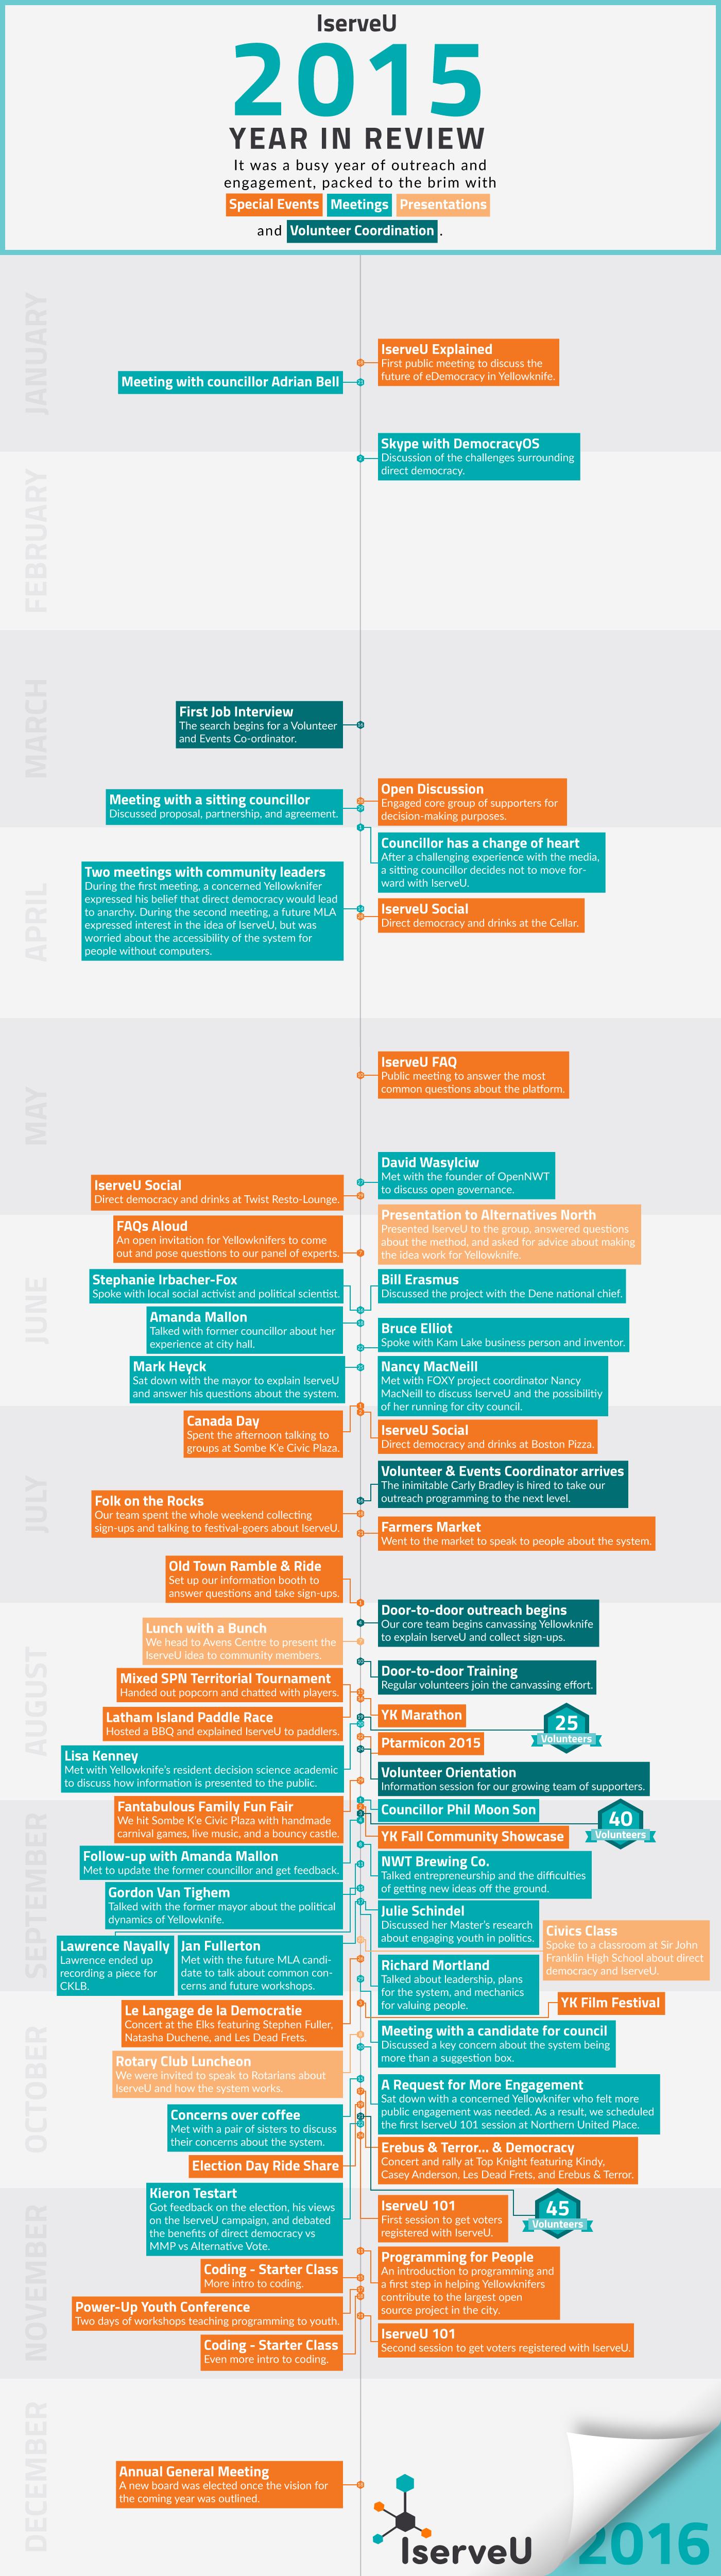 IserveU-2015-outreach-timeline_(1).png